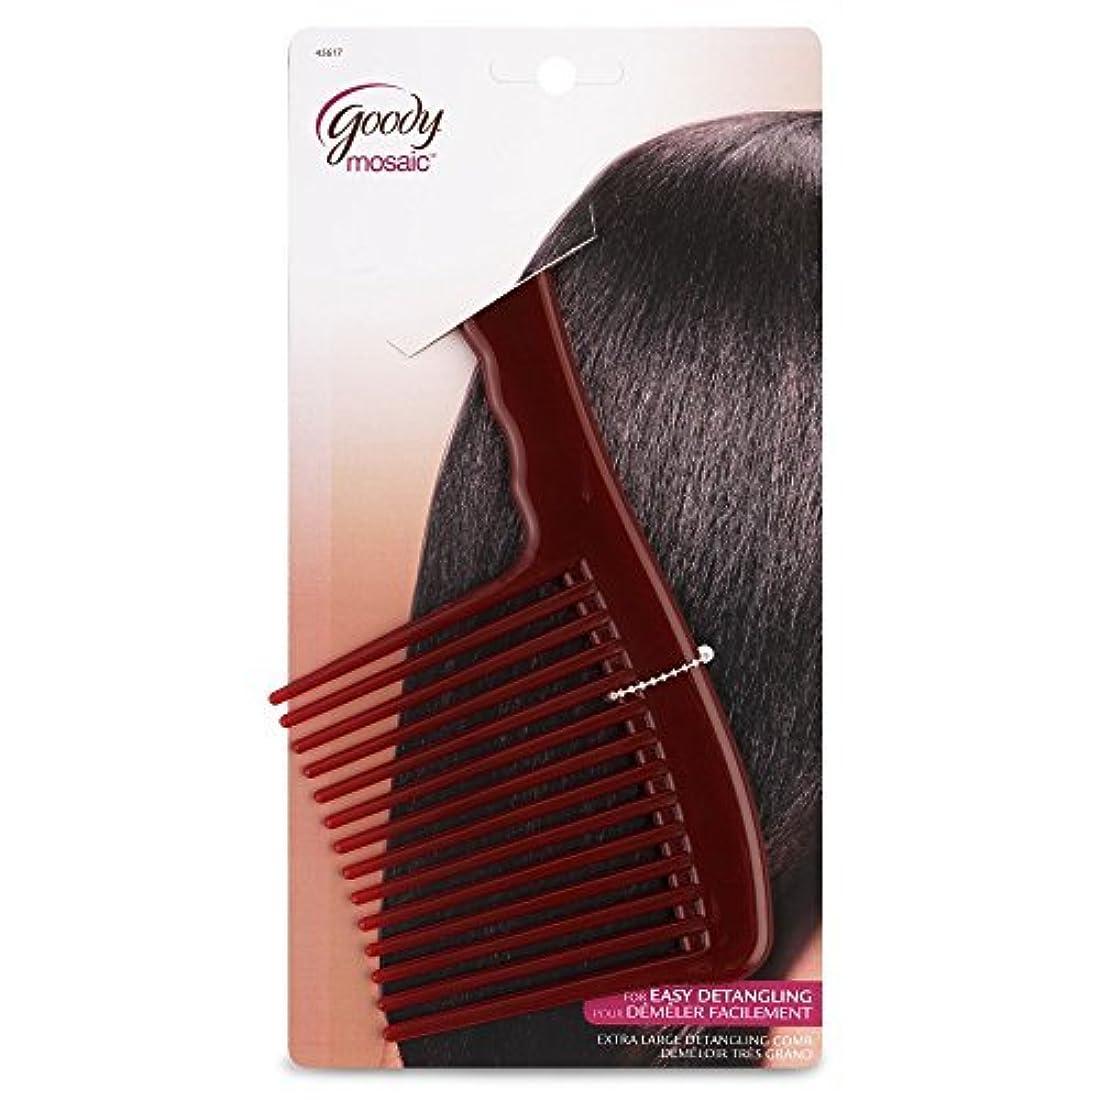 Goody Mosaic Comb, Detangling Hair Rake [並行輸入品]